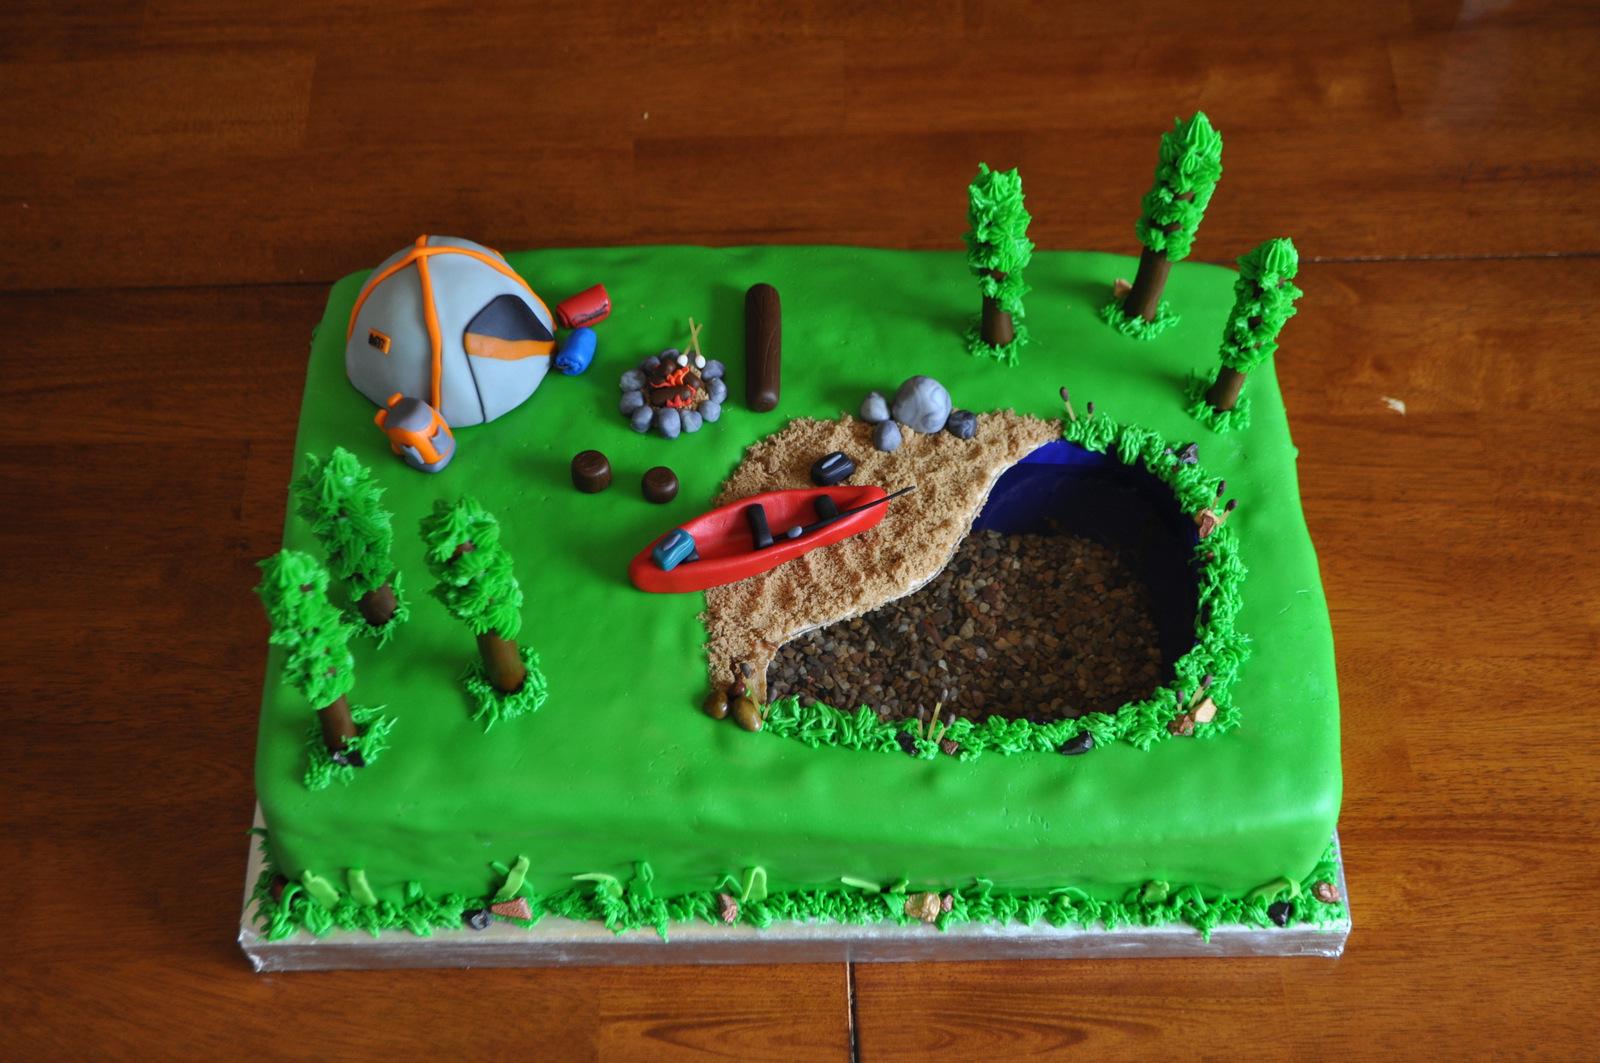 Peach Of Cake Camping Birthday Cake